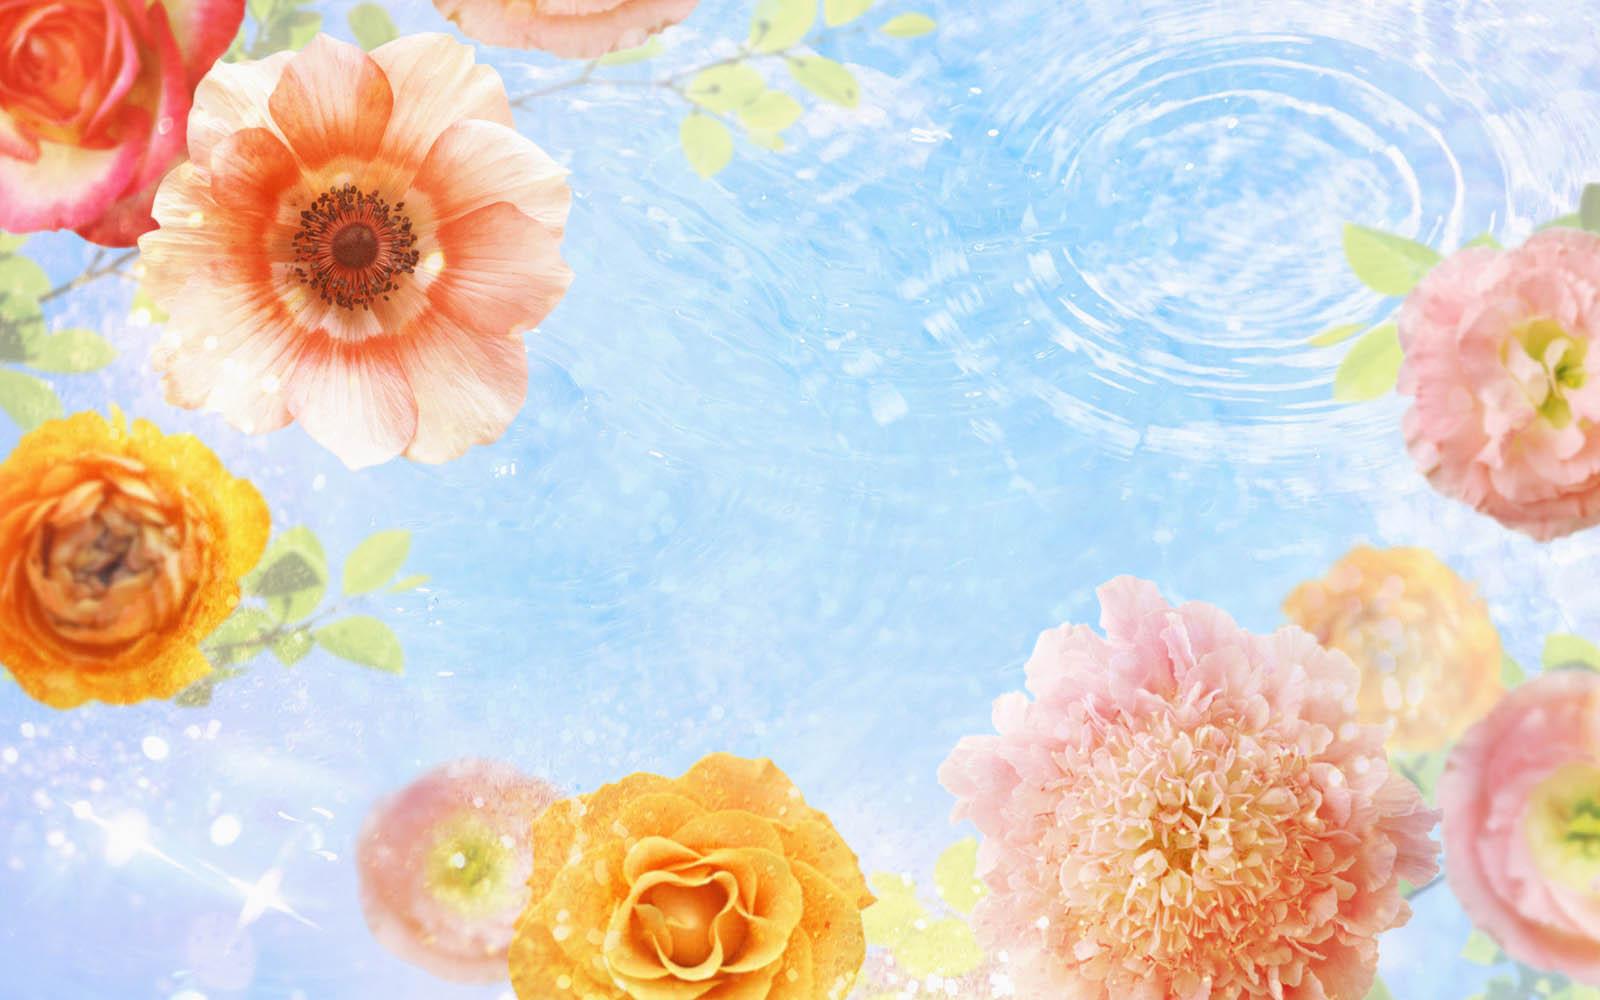 wallpapers: Flower Art Wallpapers